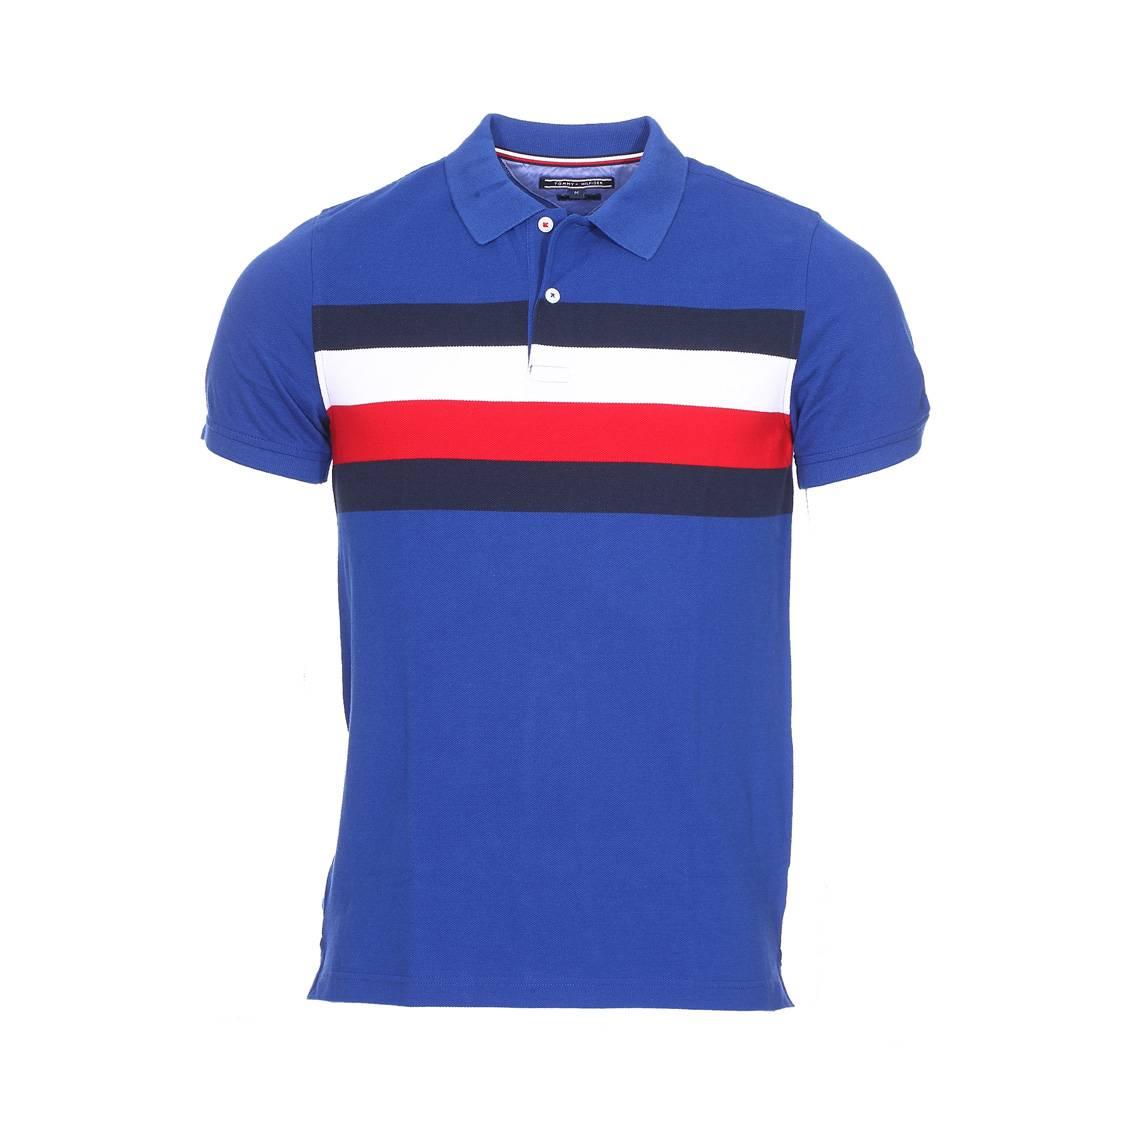 Polo Tommy Hilfiger Chest Stripe En Maille Piquee Bleu Roi Rue Des